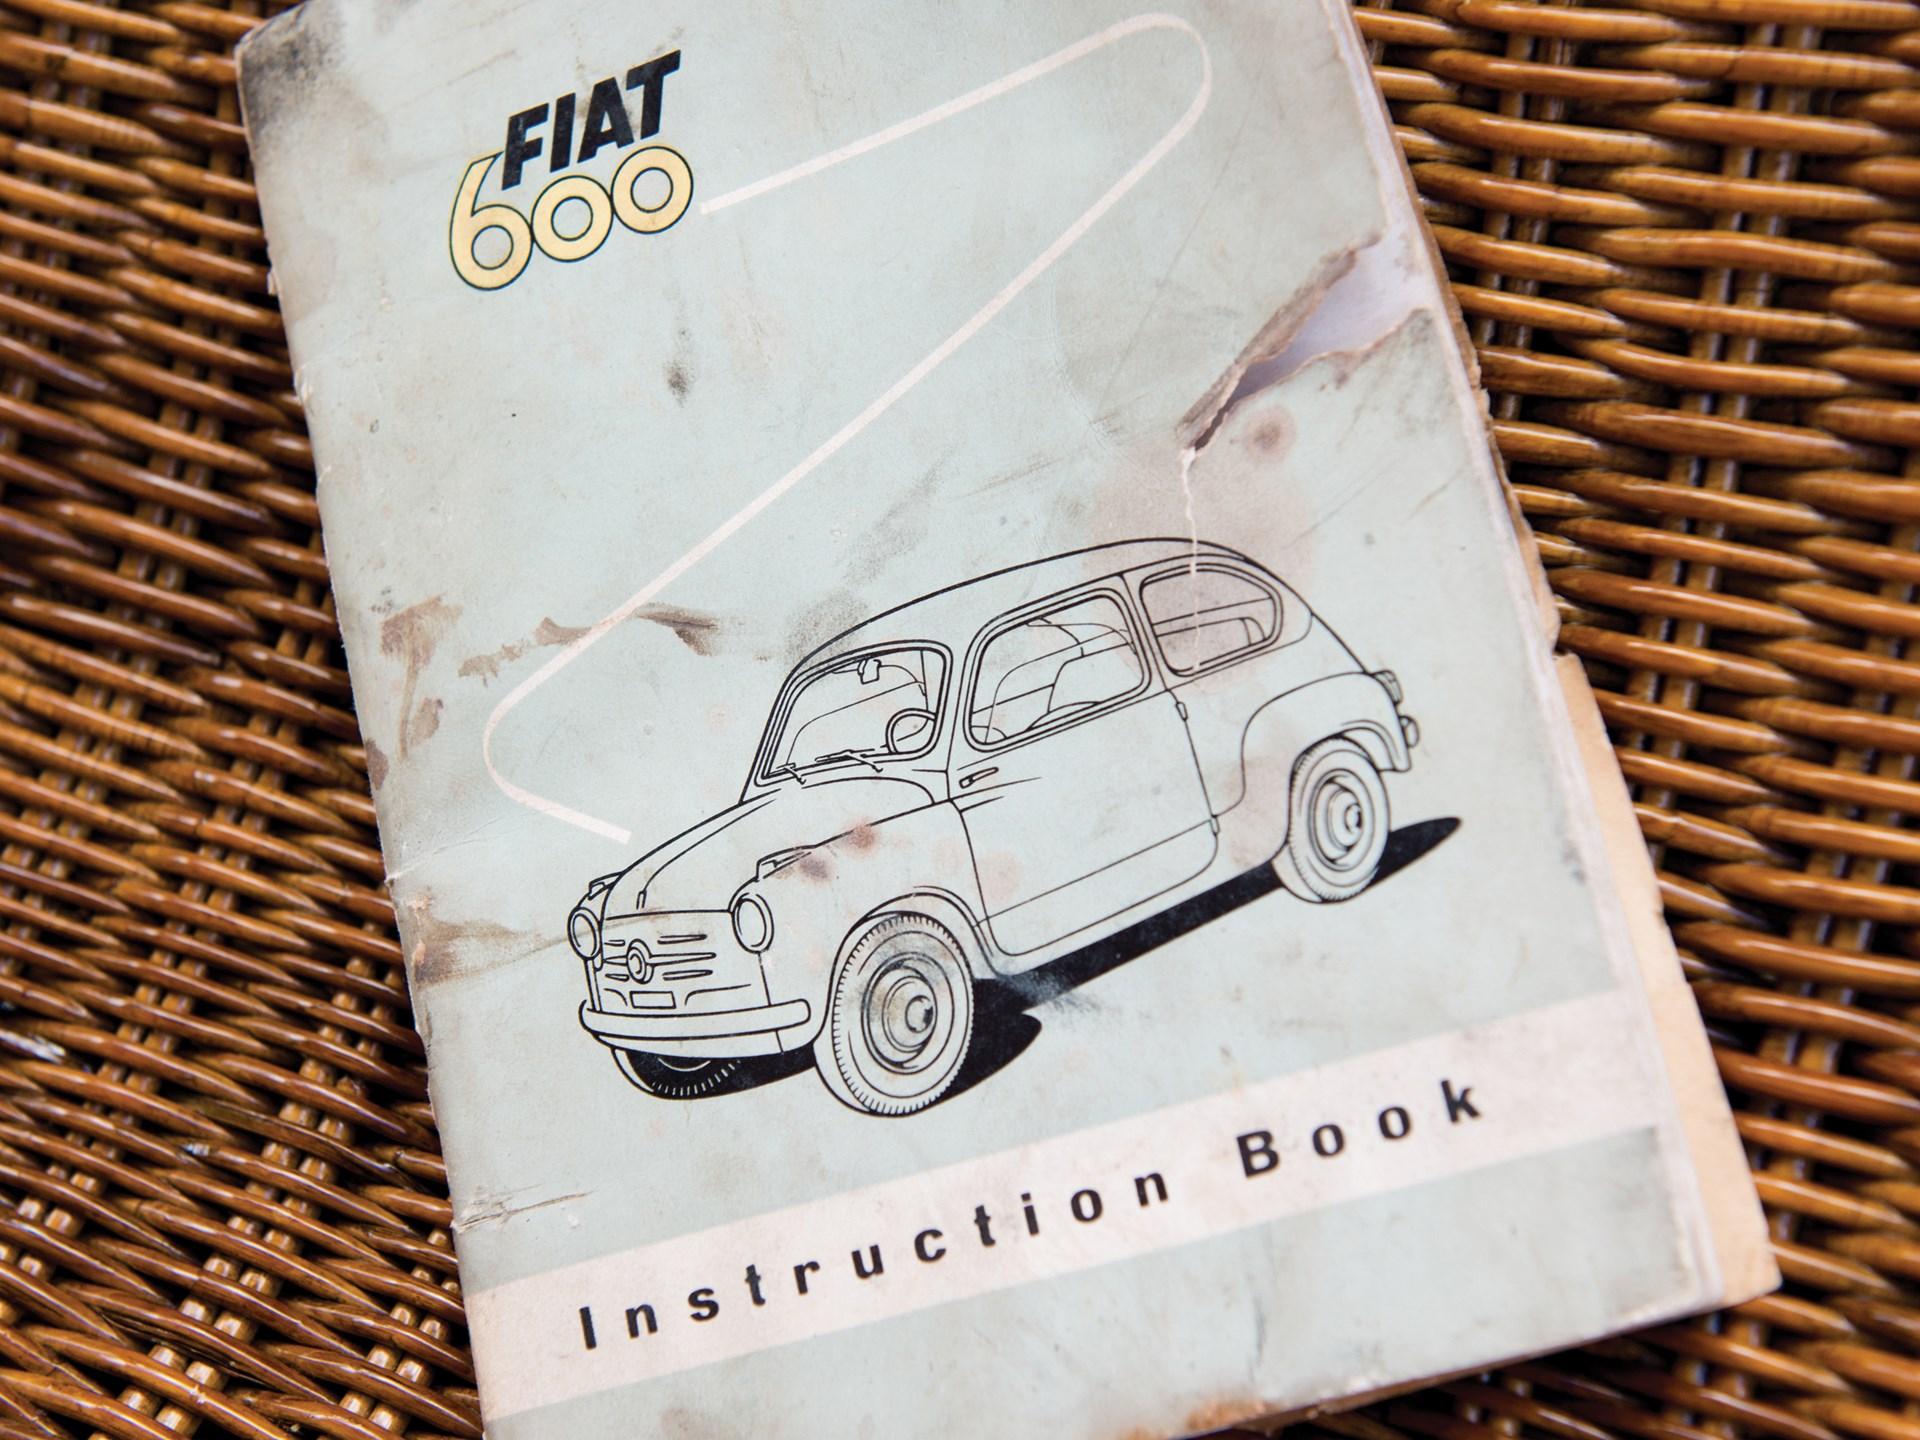 1958 fiat 600 jolly by ghia